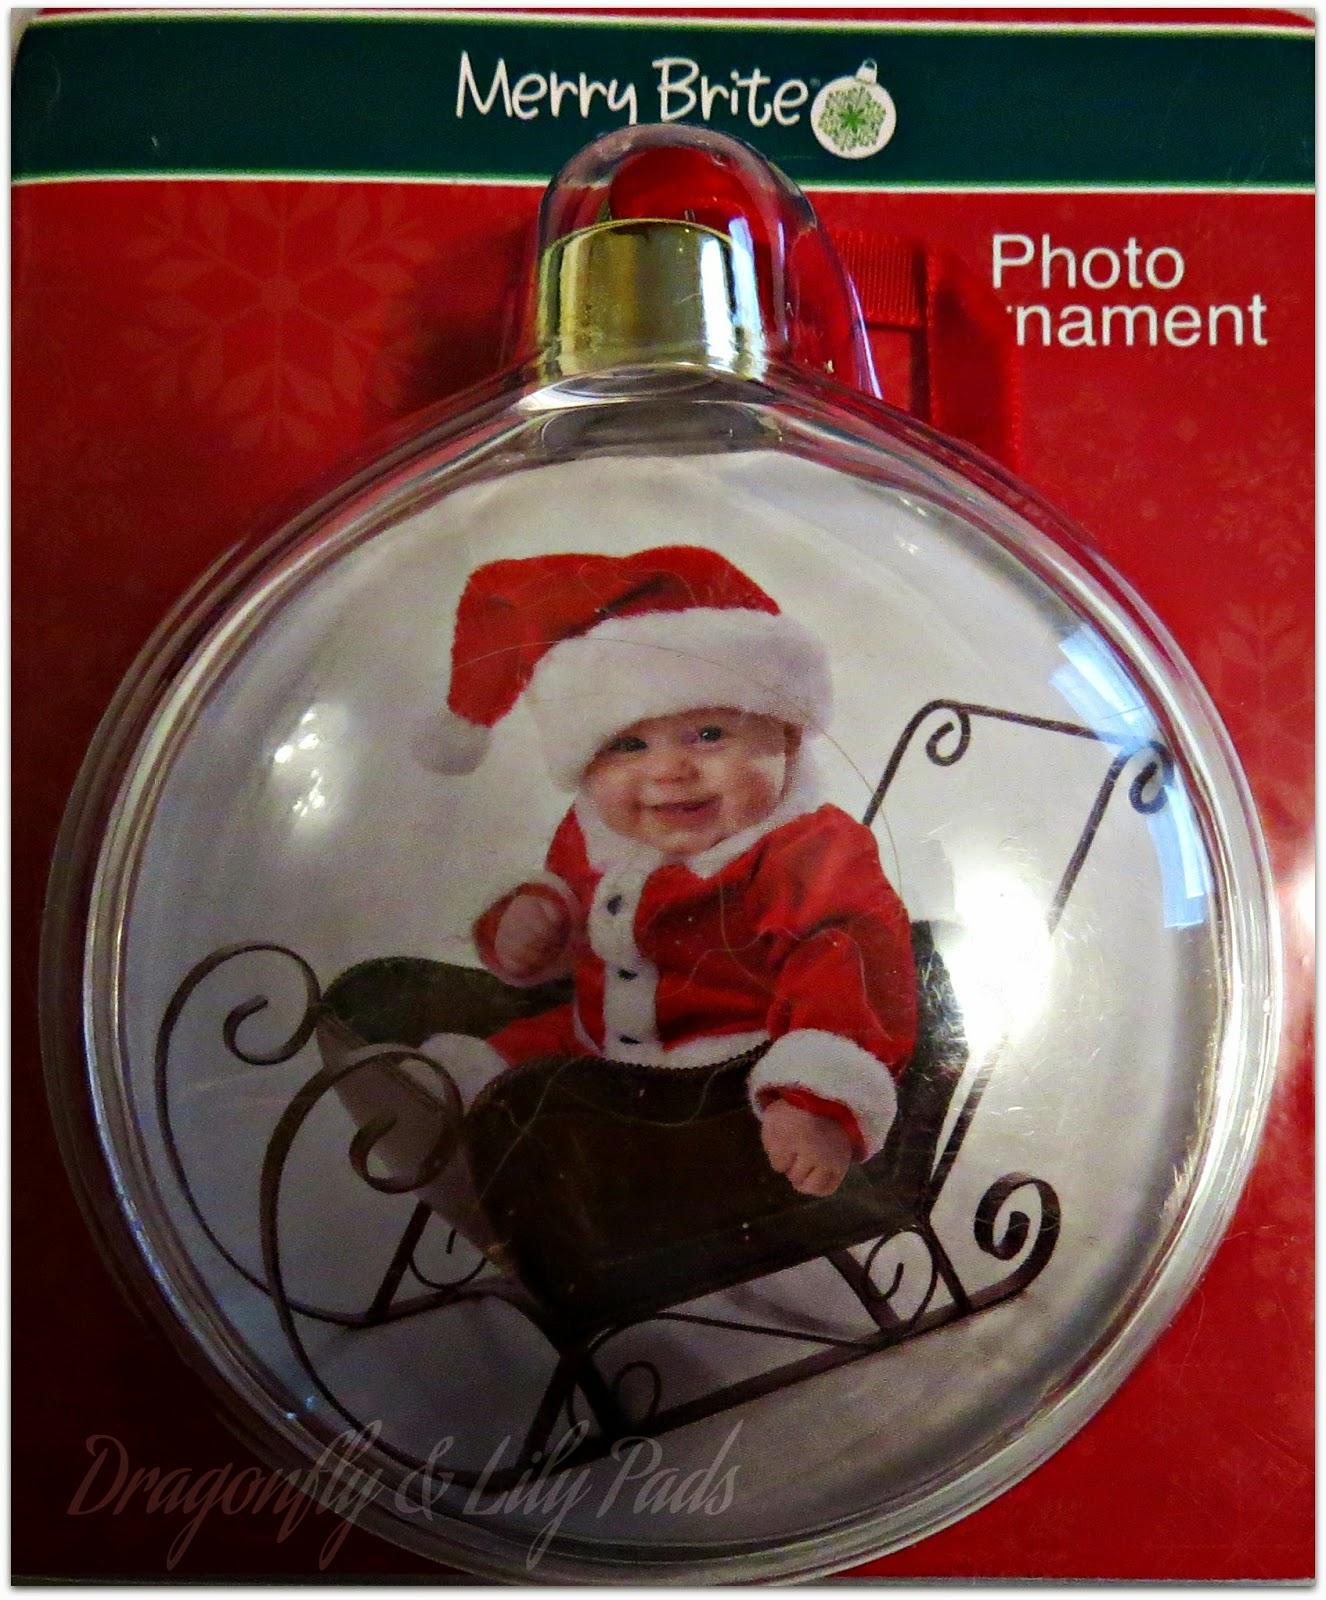 Merry Brite Photo Ornament, D&LP Designs, Elf Gift Exchange bonds Bloggers